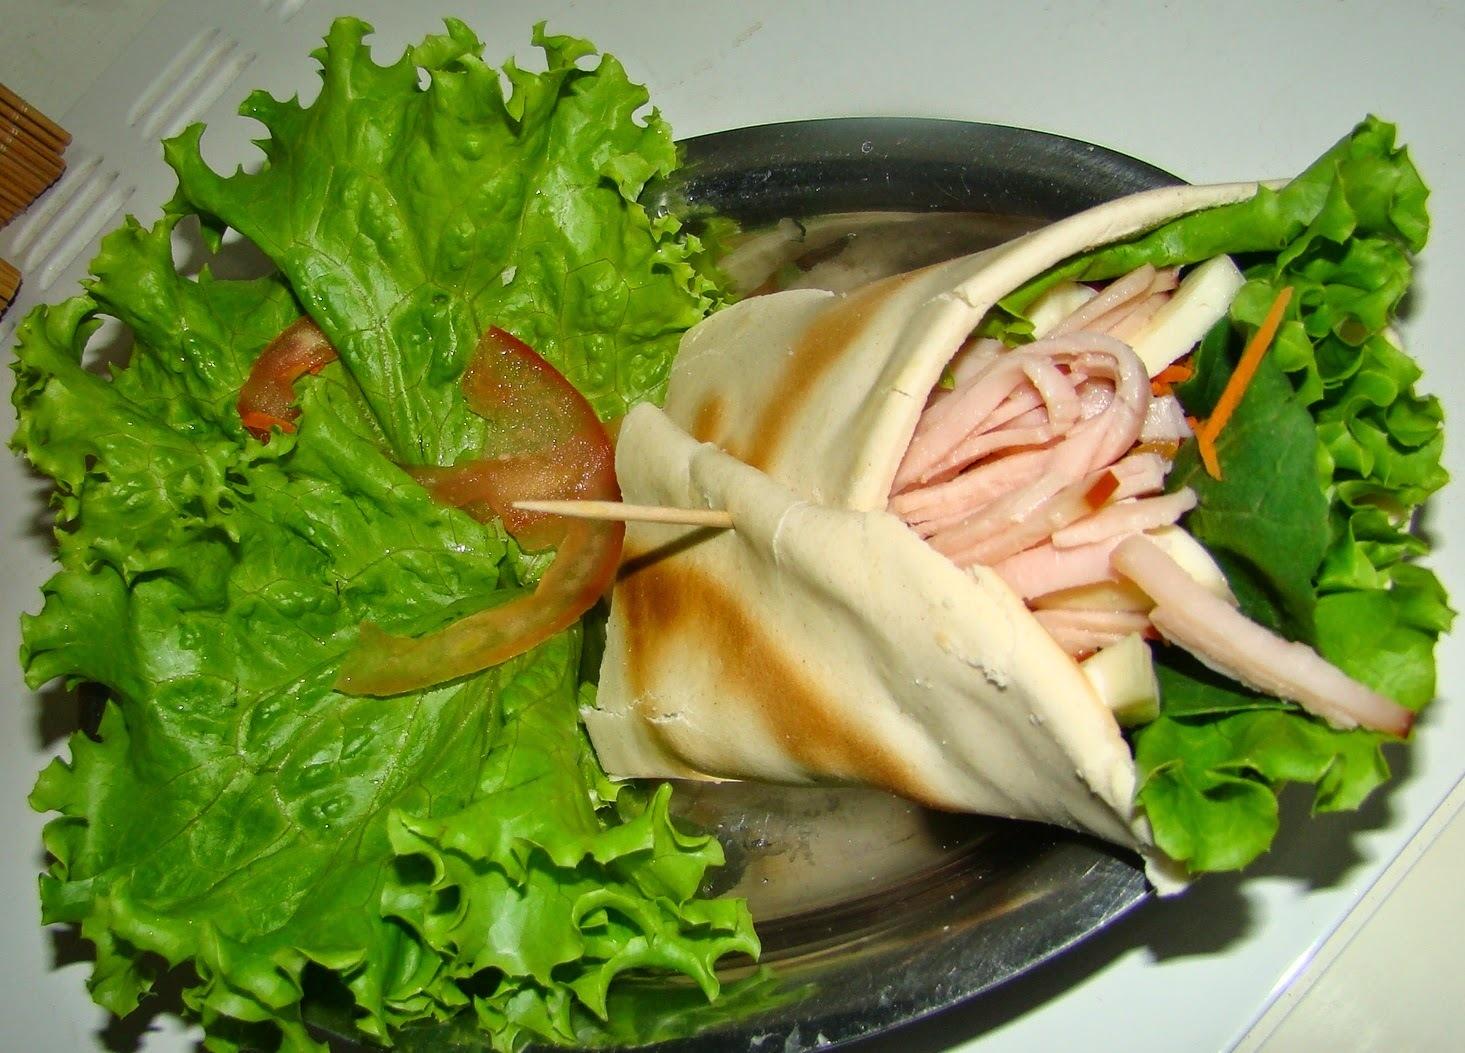 sanduiche natural pao sirio